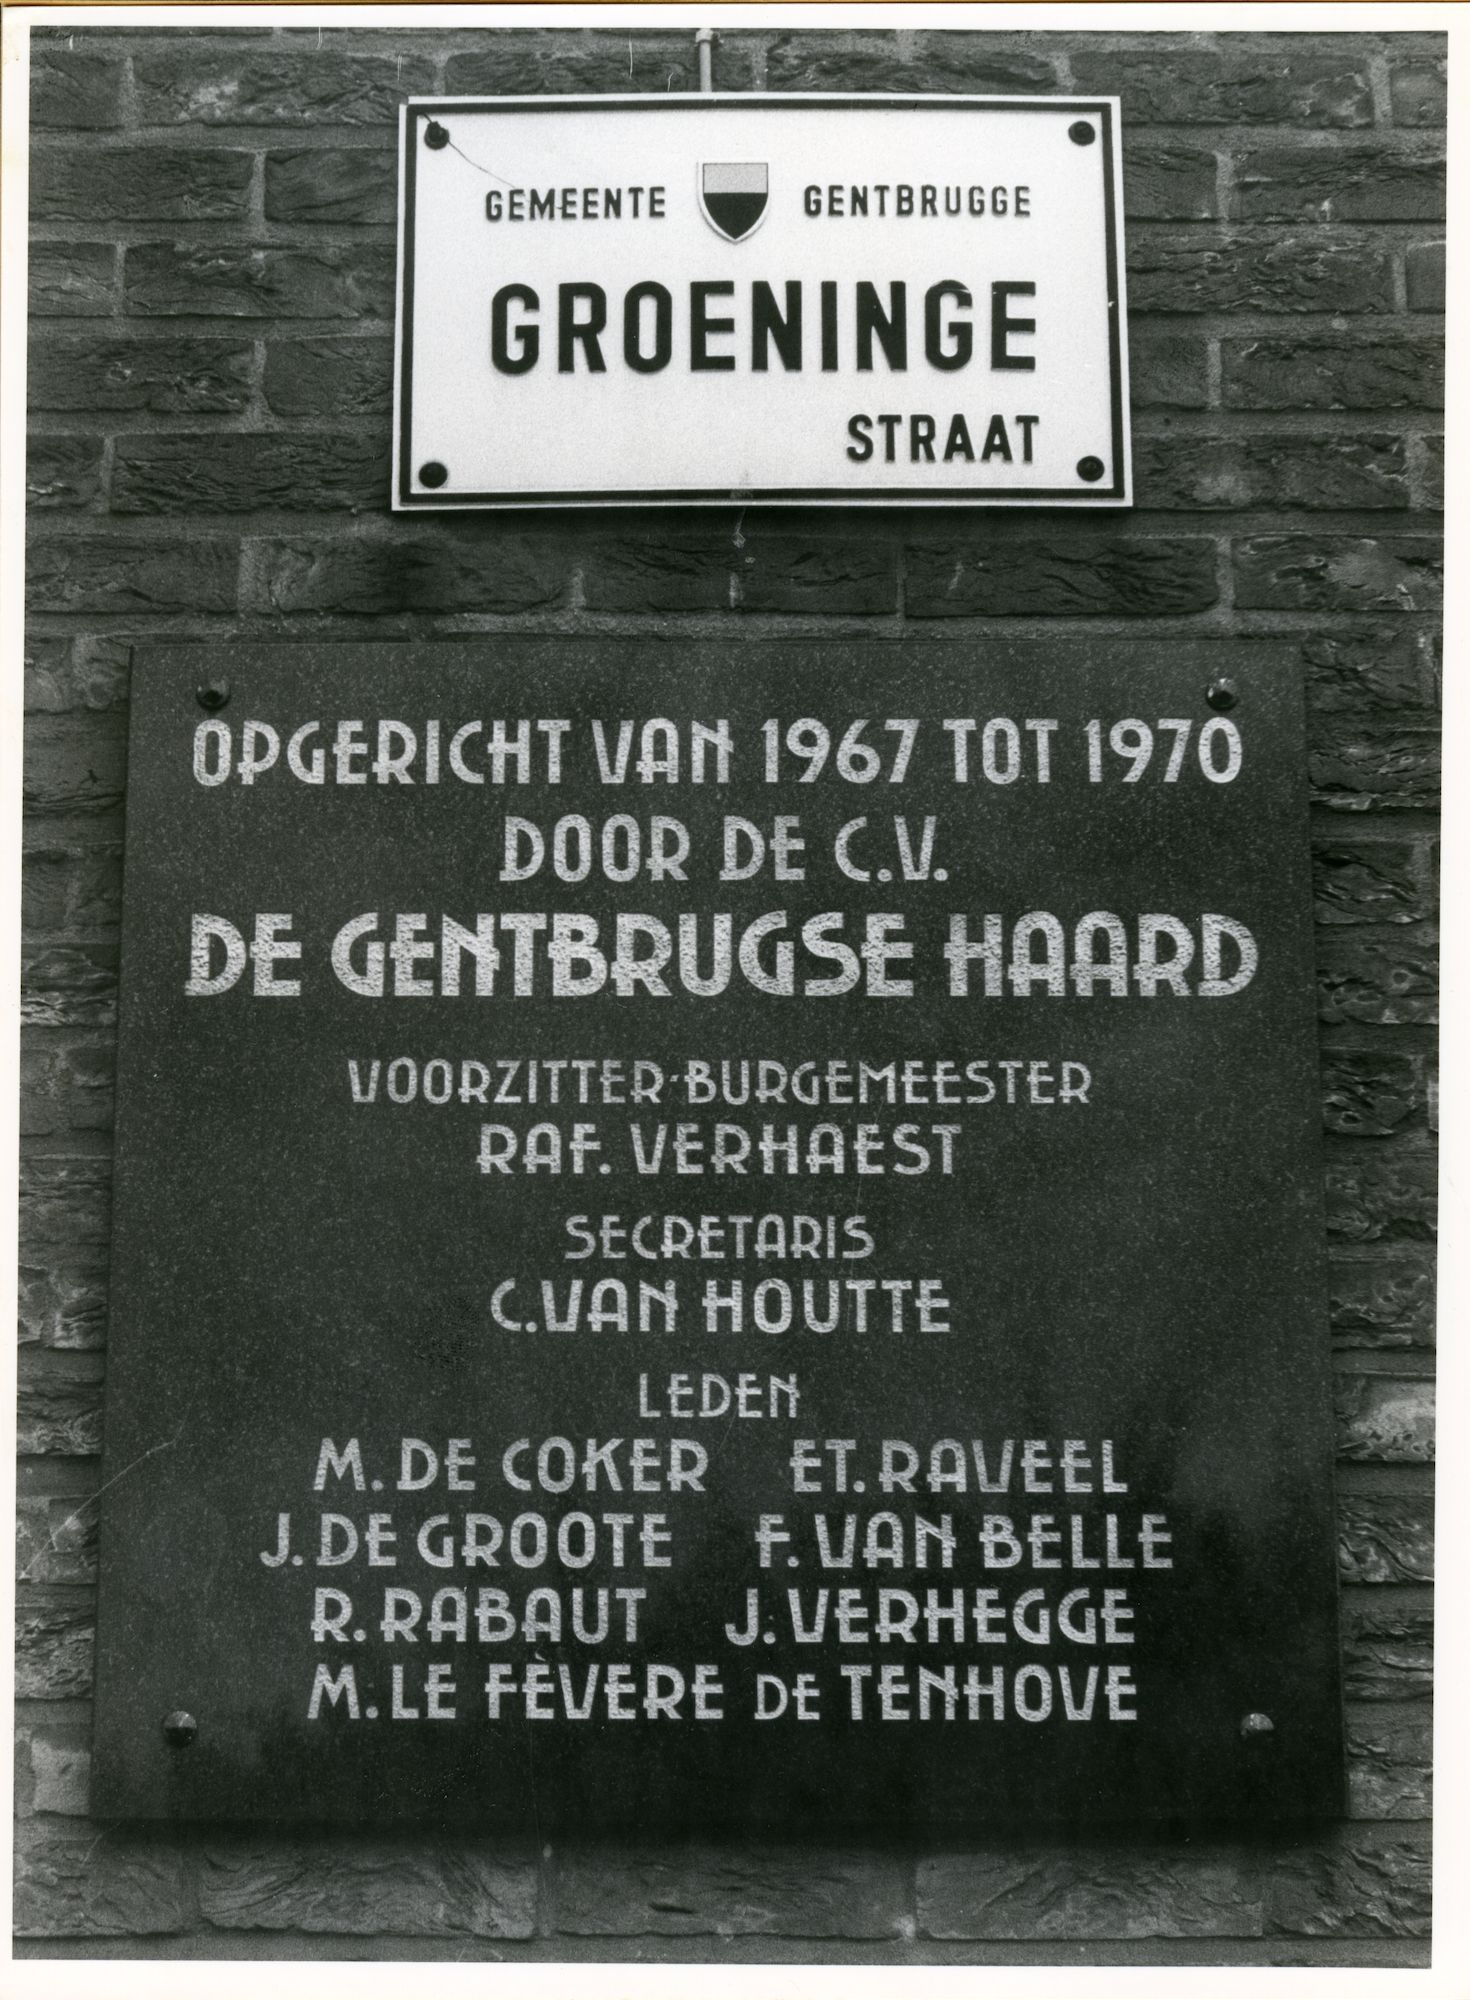 Gentbrugge: Groeningestraat 22: Gedenksteen, 1979